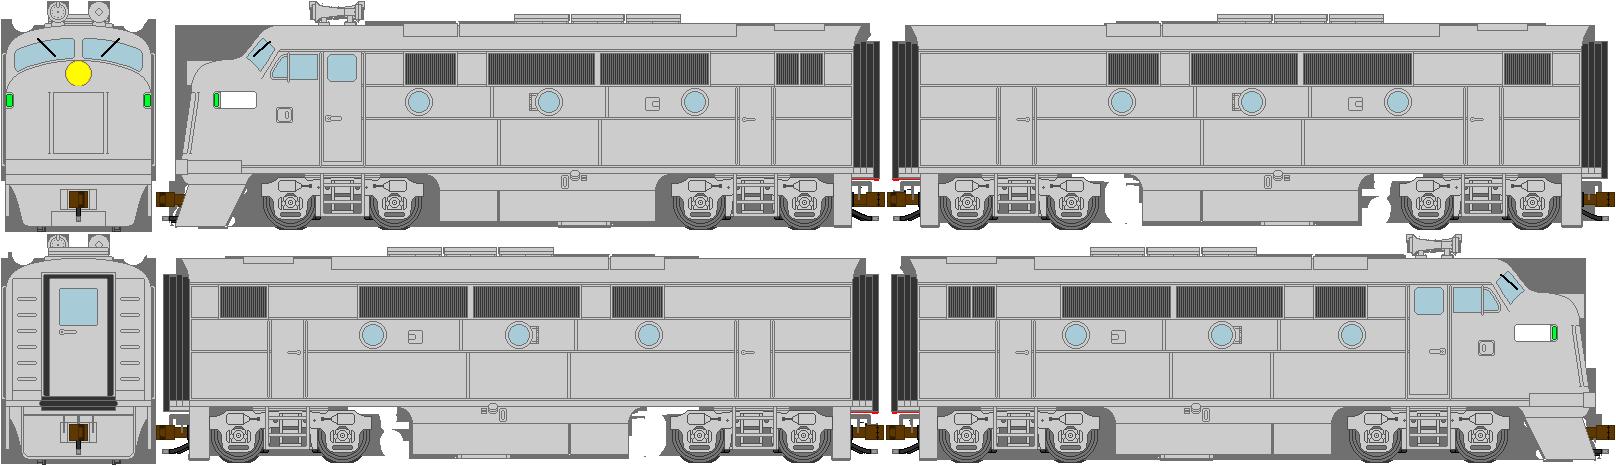 F2A, F3A, And F3B Phase 1 (Base)